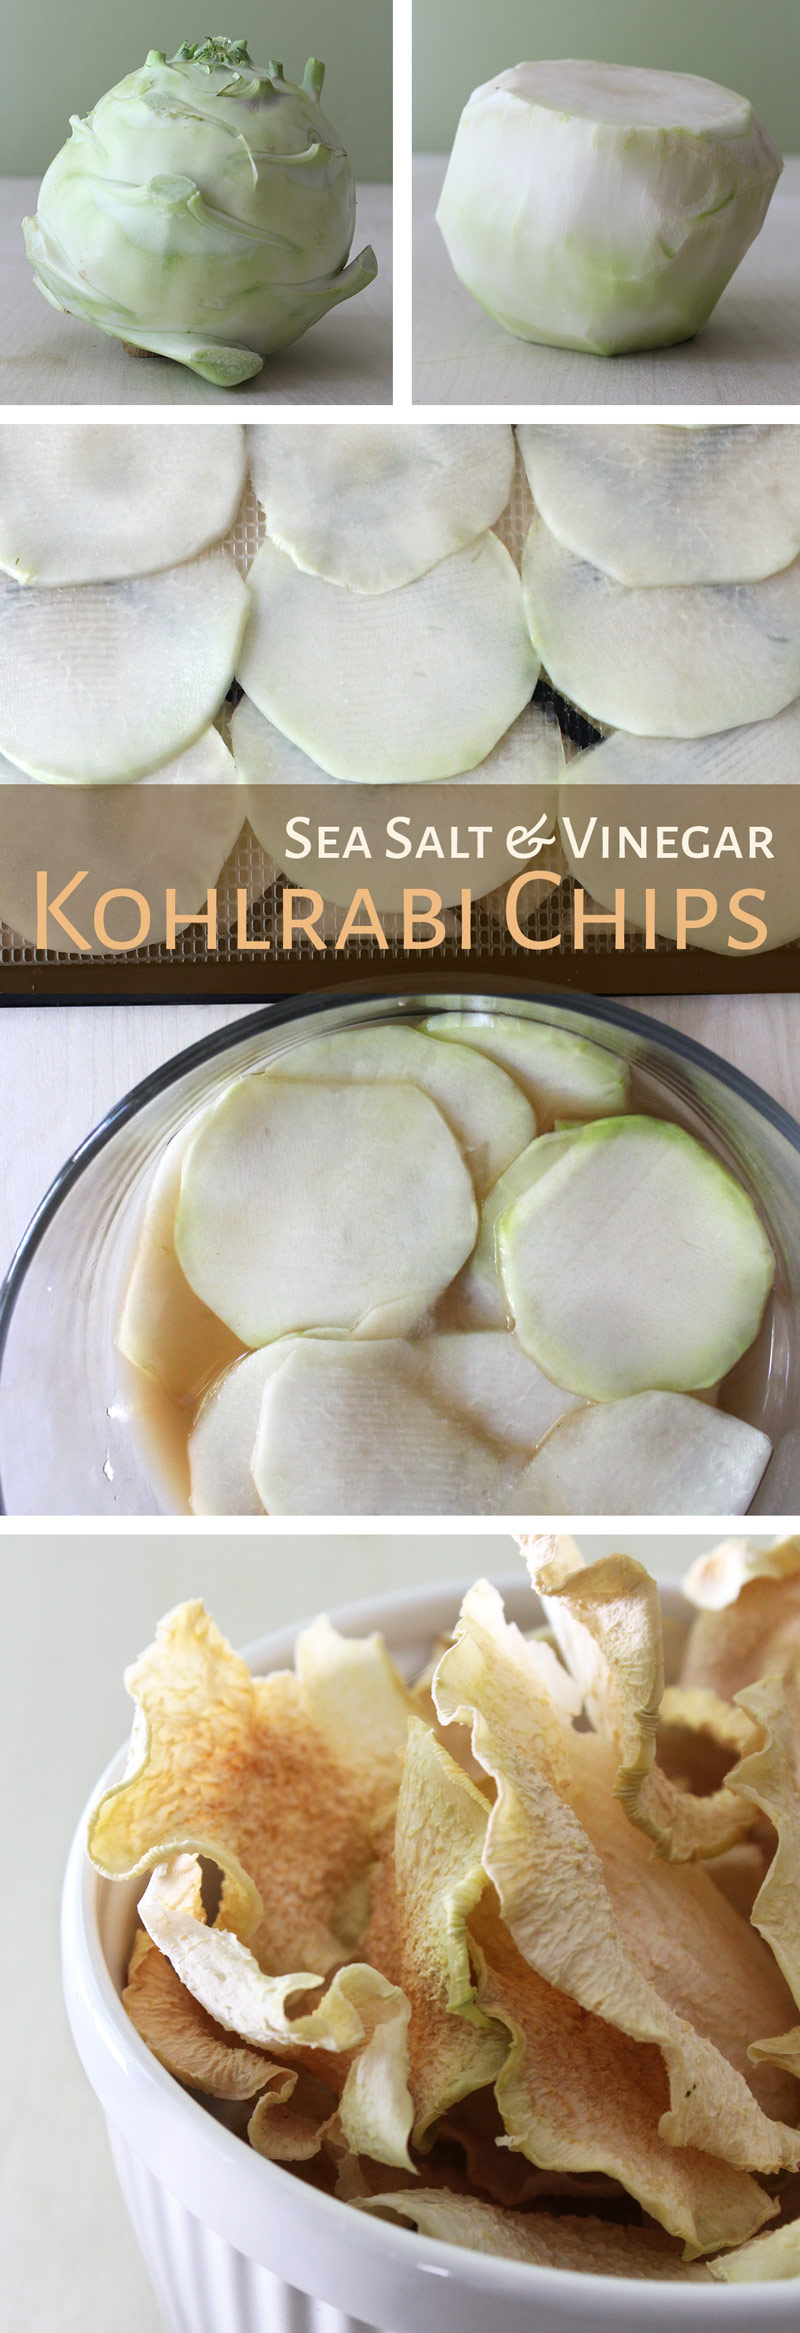 Dehydrated Sea Salt & Vinegar Chips